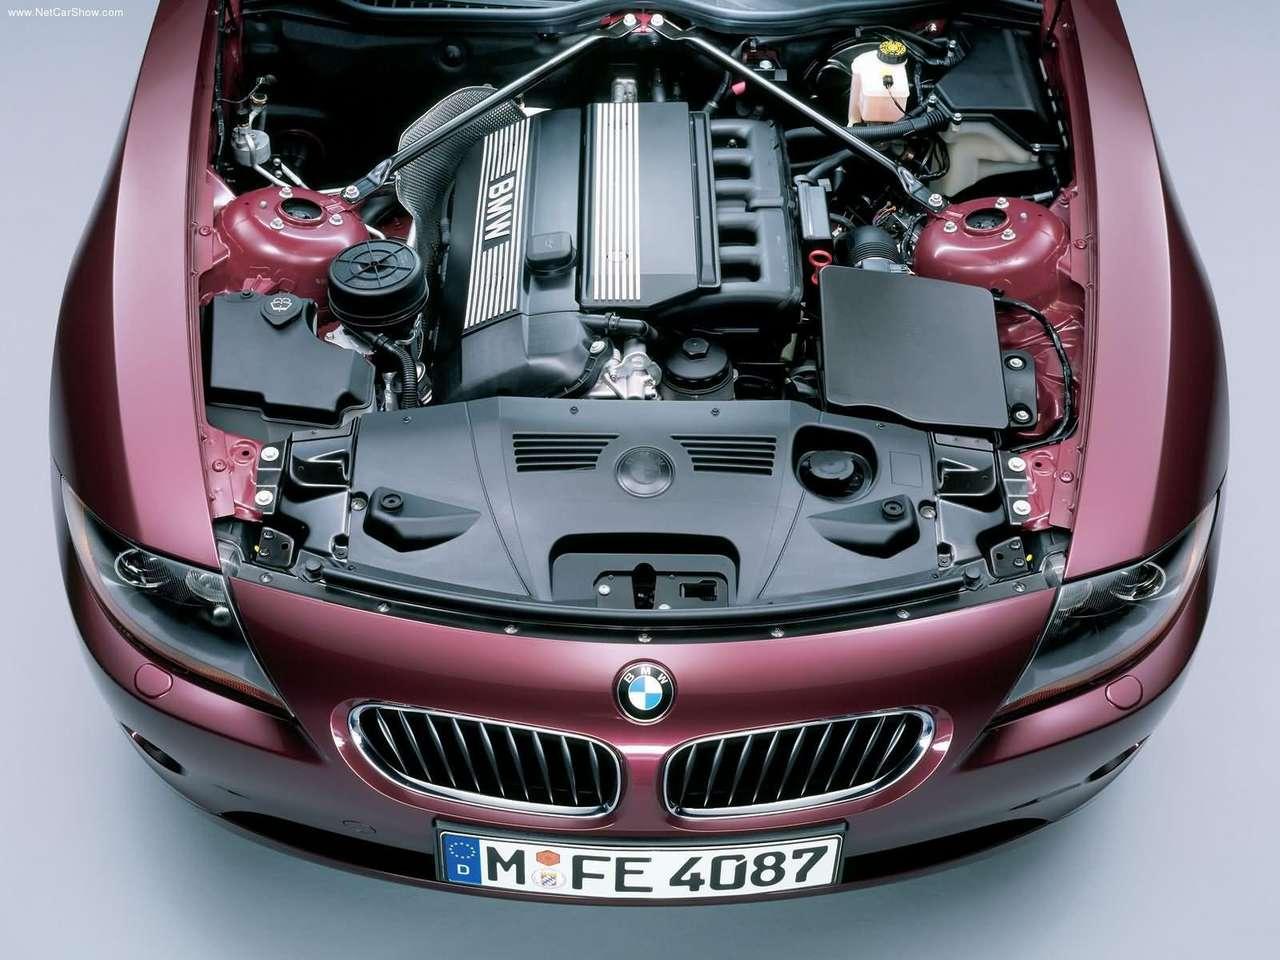 The BMW Z4 - Fancy a smart, German roadster? Look no further.